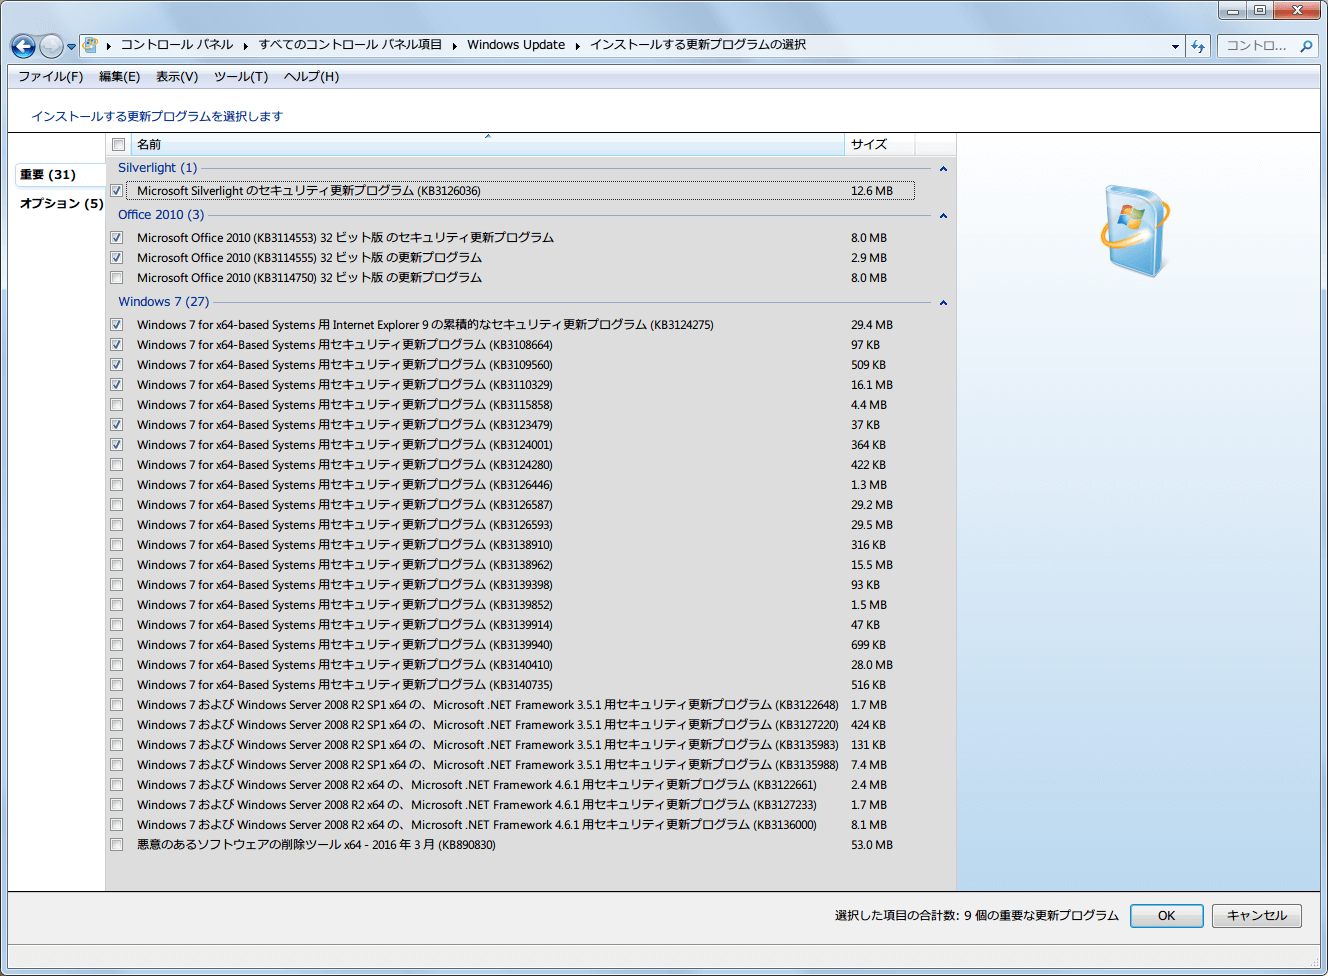 Windows 7 64bit Windows Update 重要 2016年2月分更新プログラムインストール